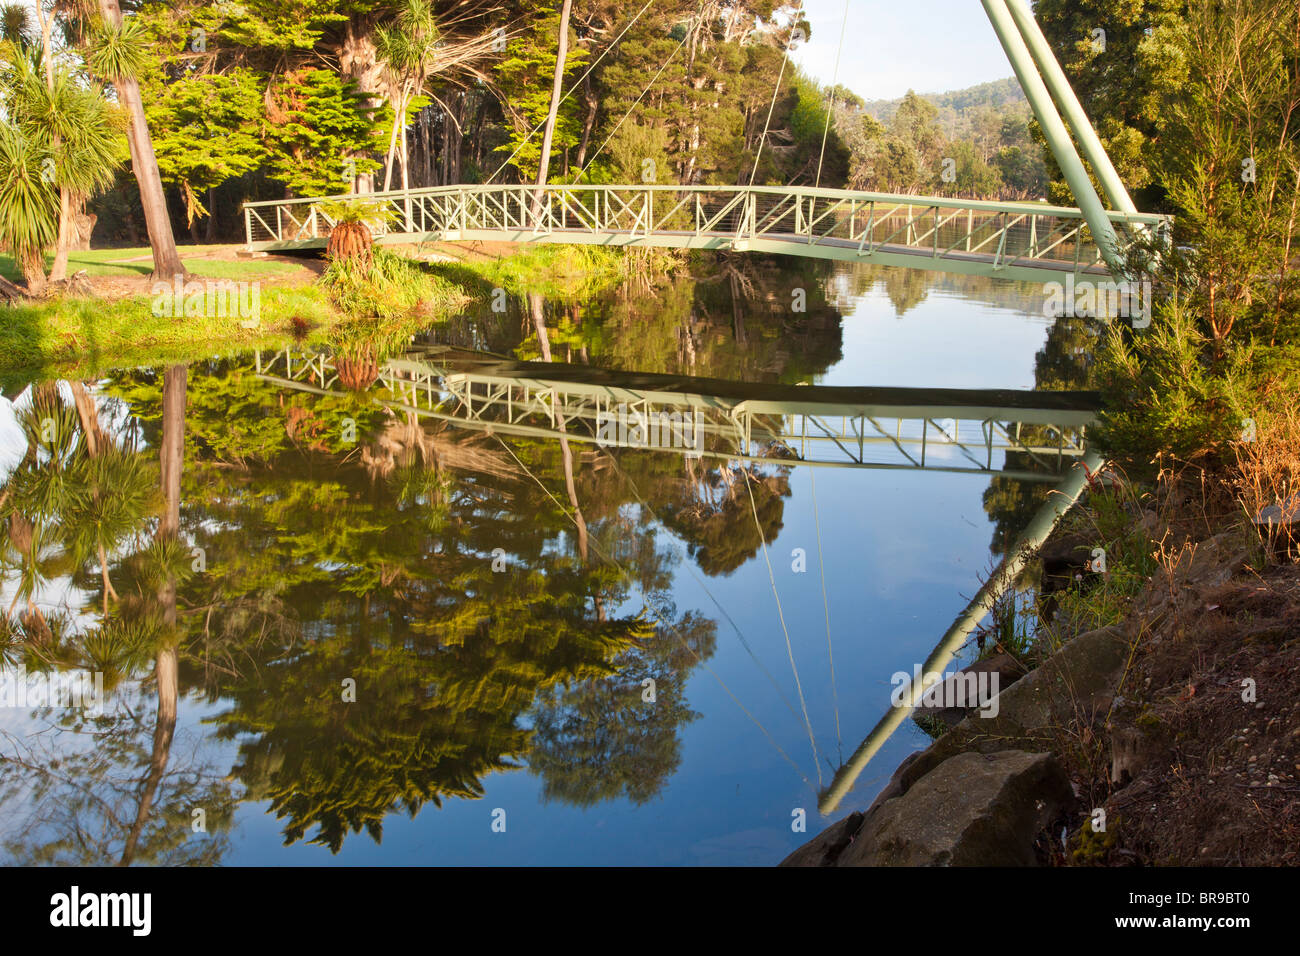 Pedestrian suspension bridge over the Mersey River in Latrobe, northern Tasmania - Stock Image